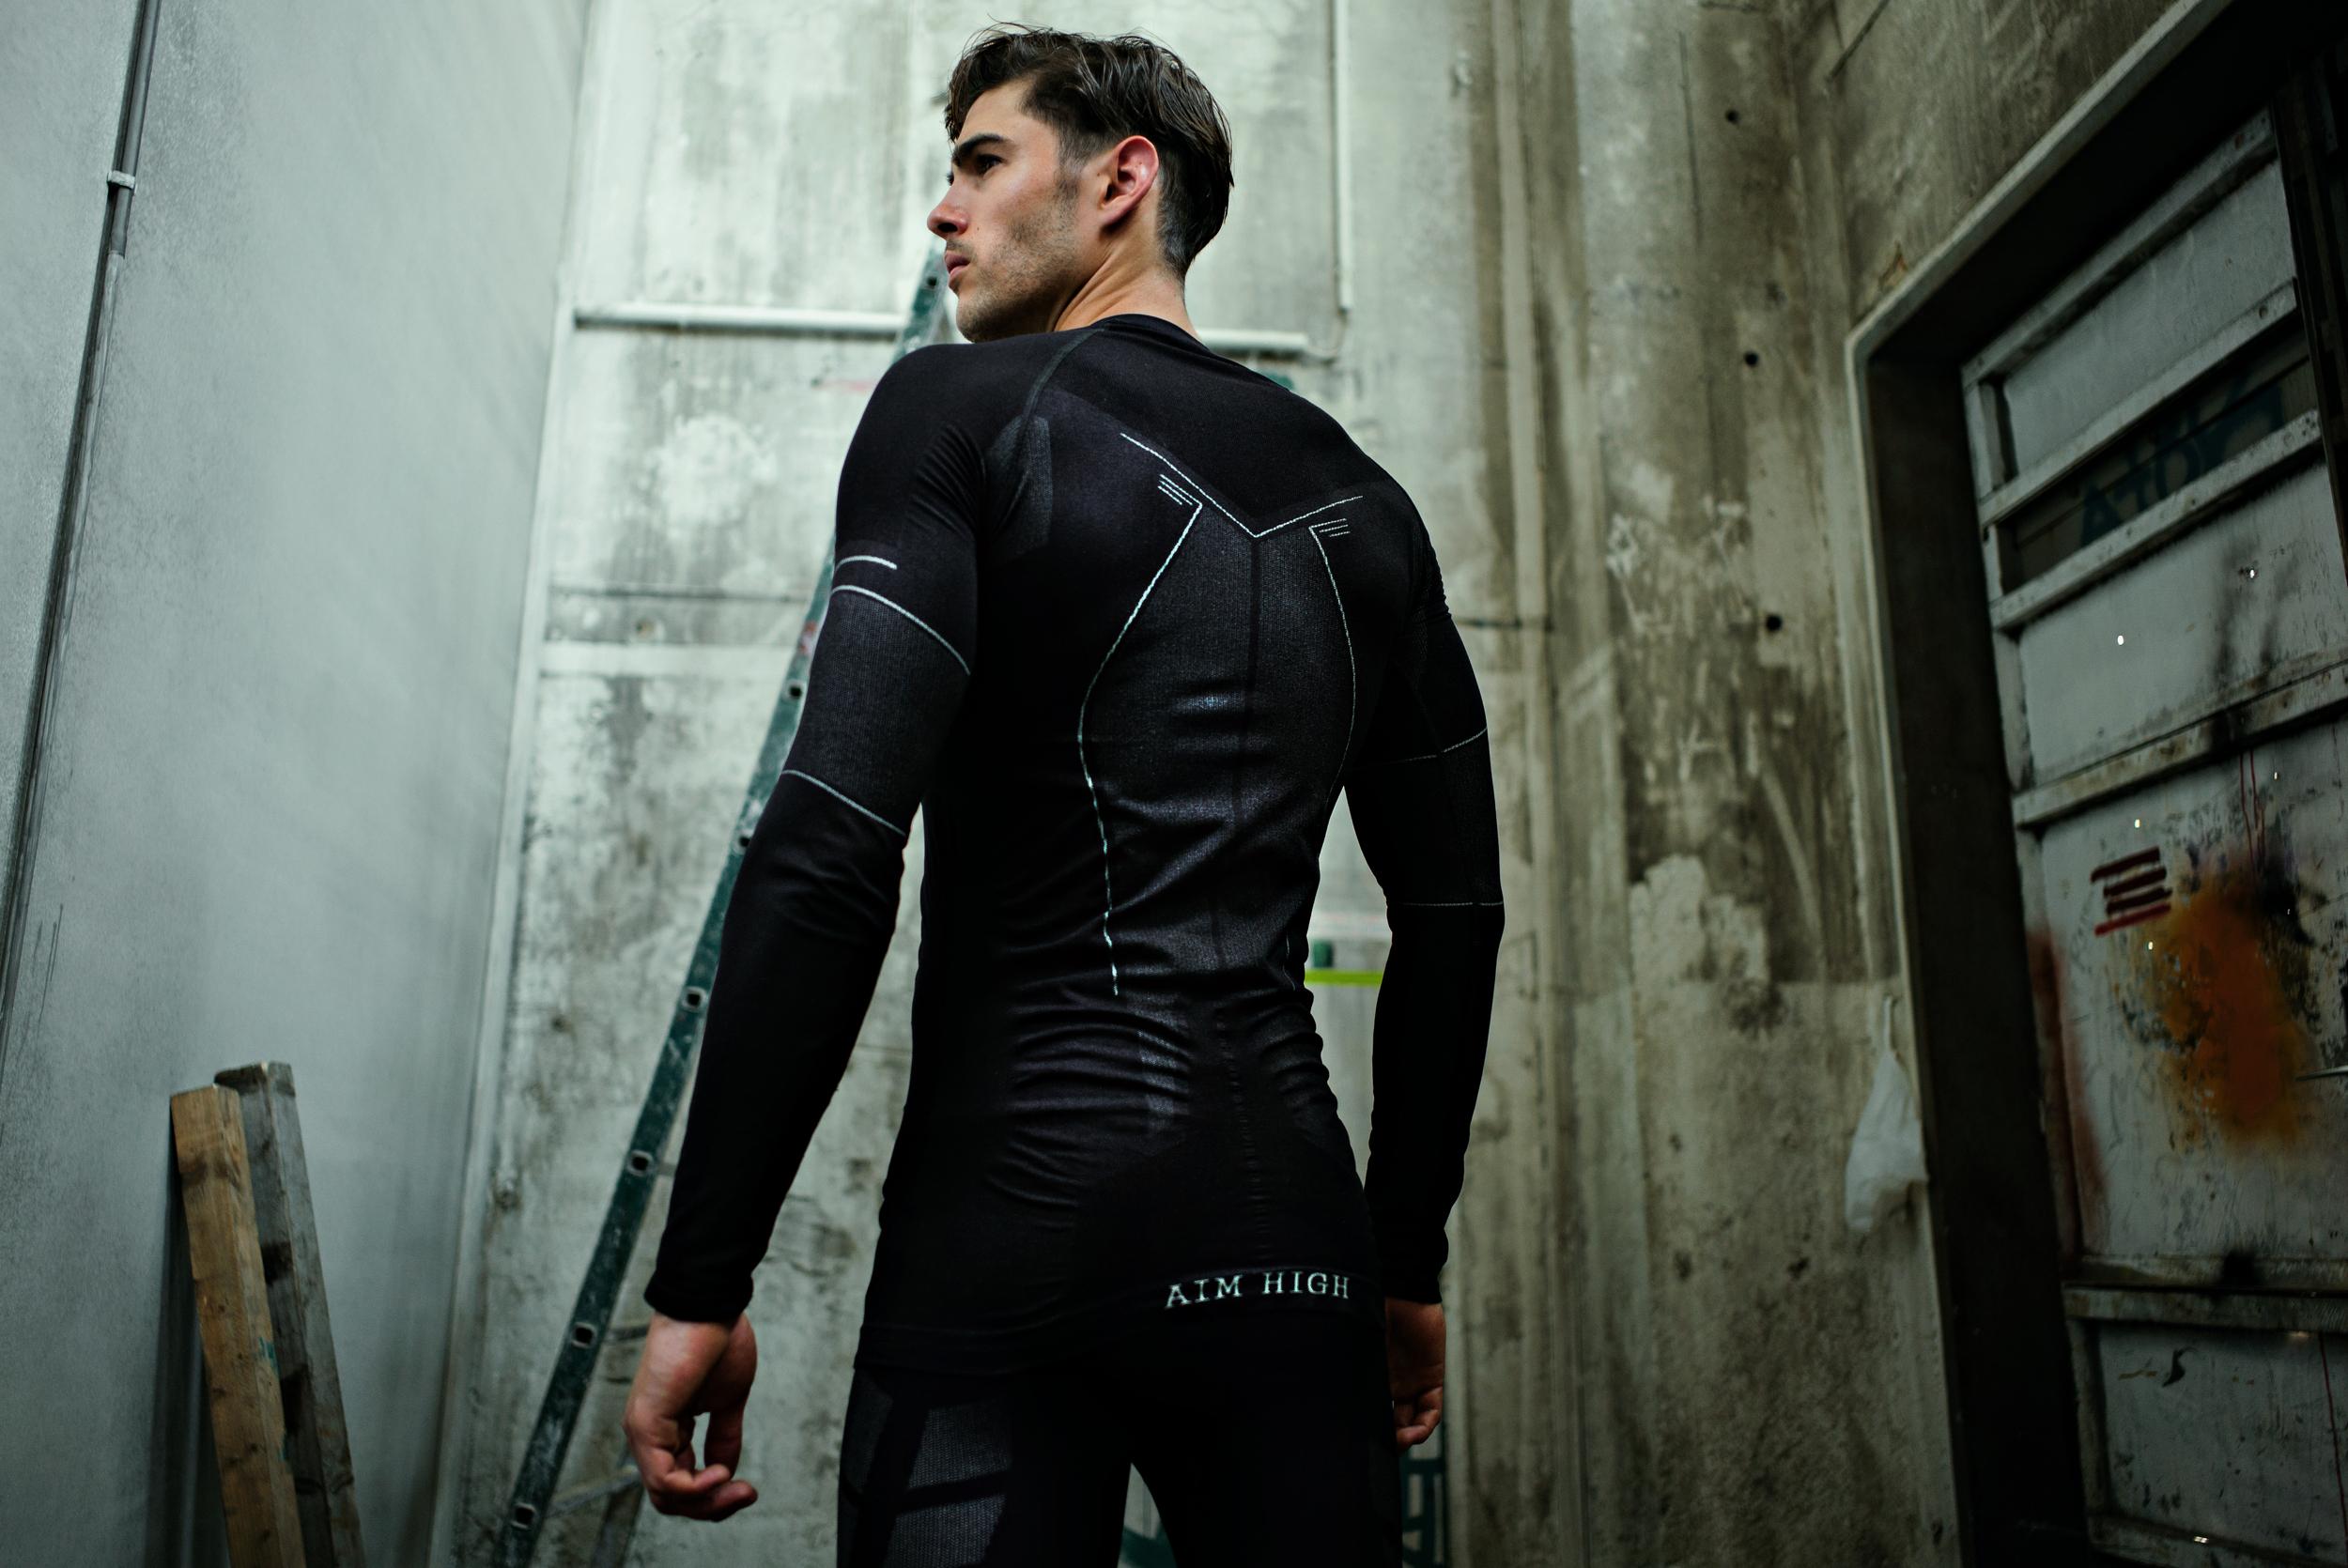 Vitali Gelwich Photographer Berlin sportswear Aim High VTLGLWCH (9 von 19).jpg